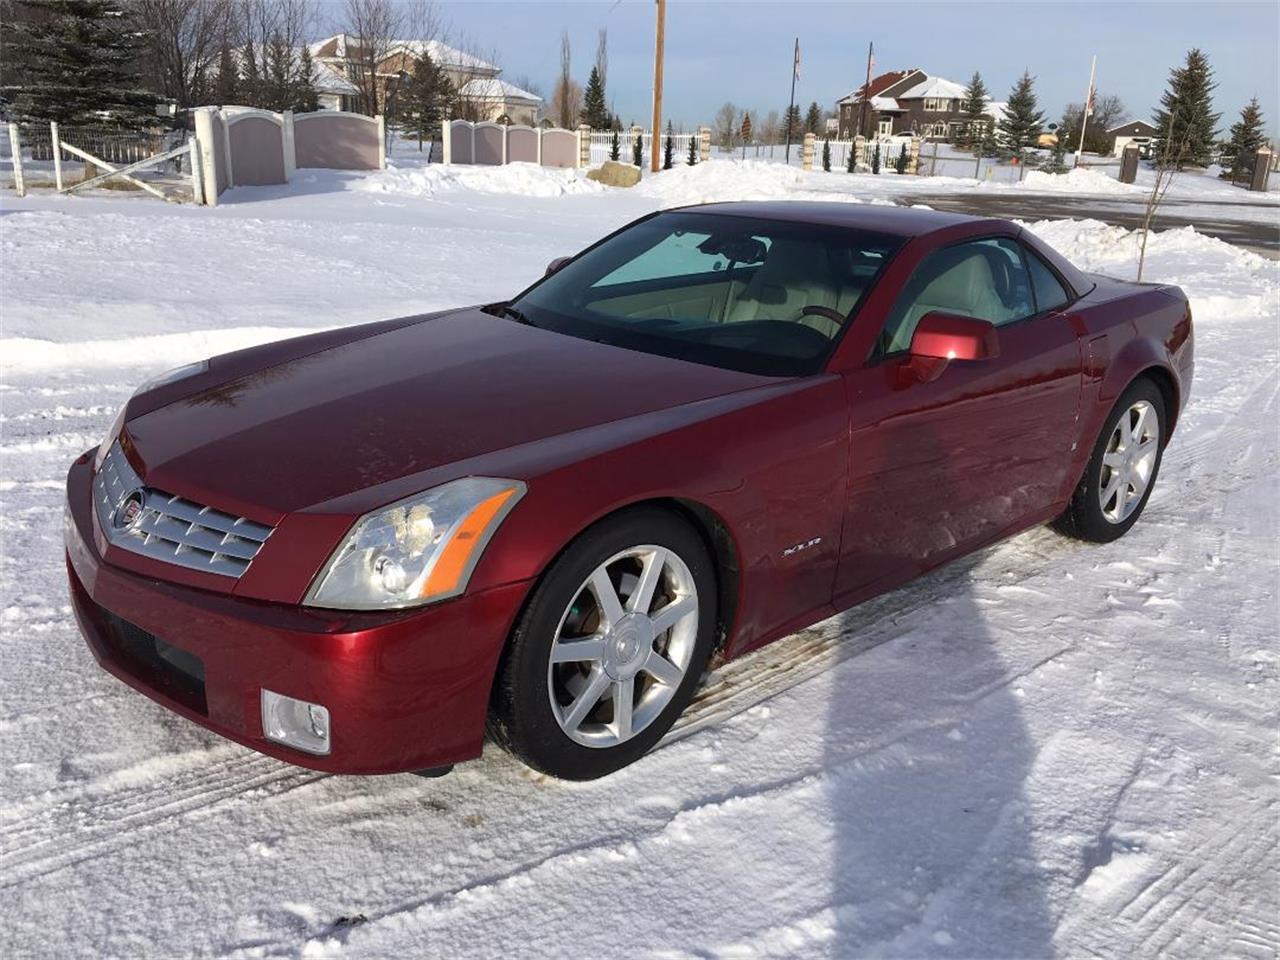 2006 Cadillac XLR for Sale | ClassicCars.com | CC-1169219